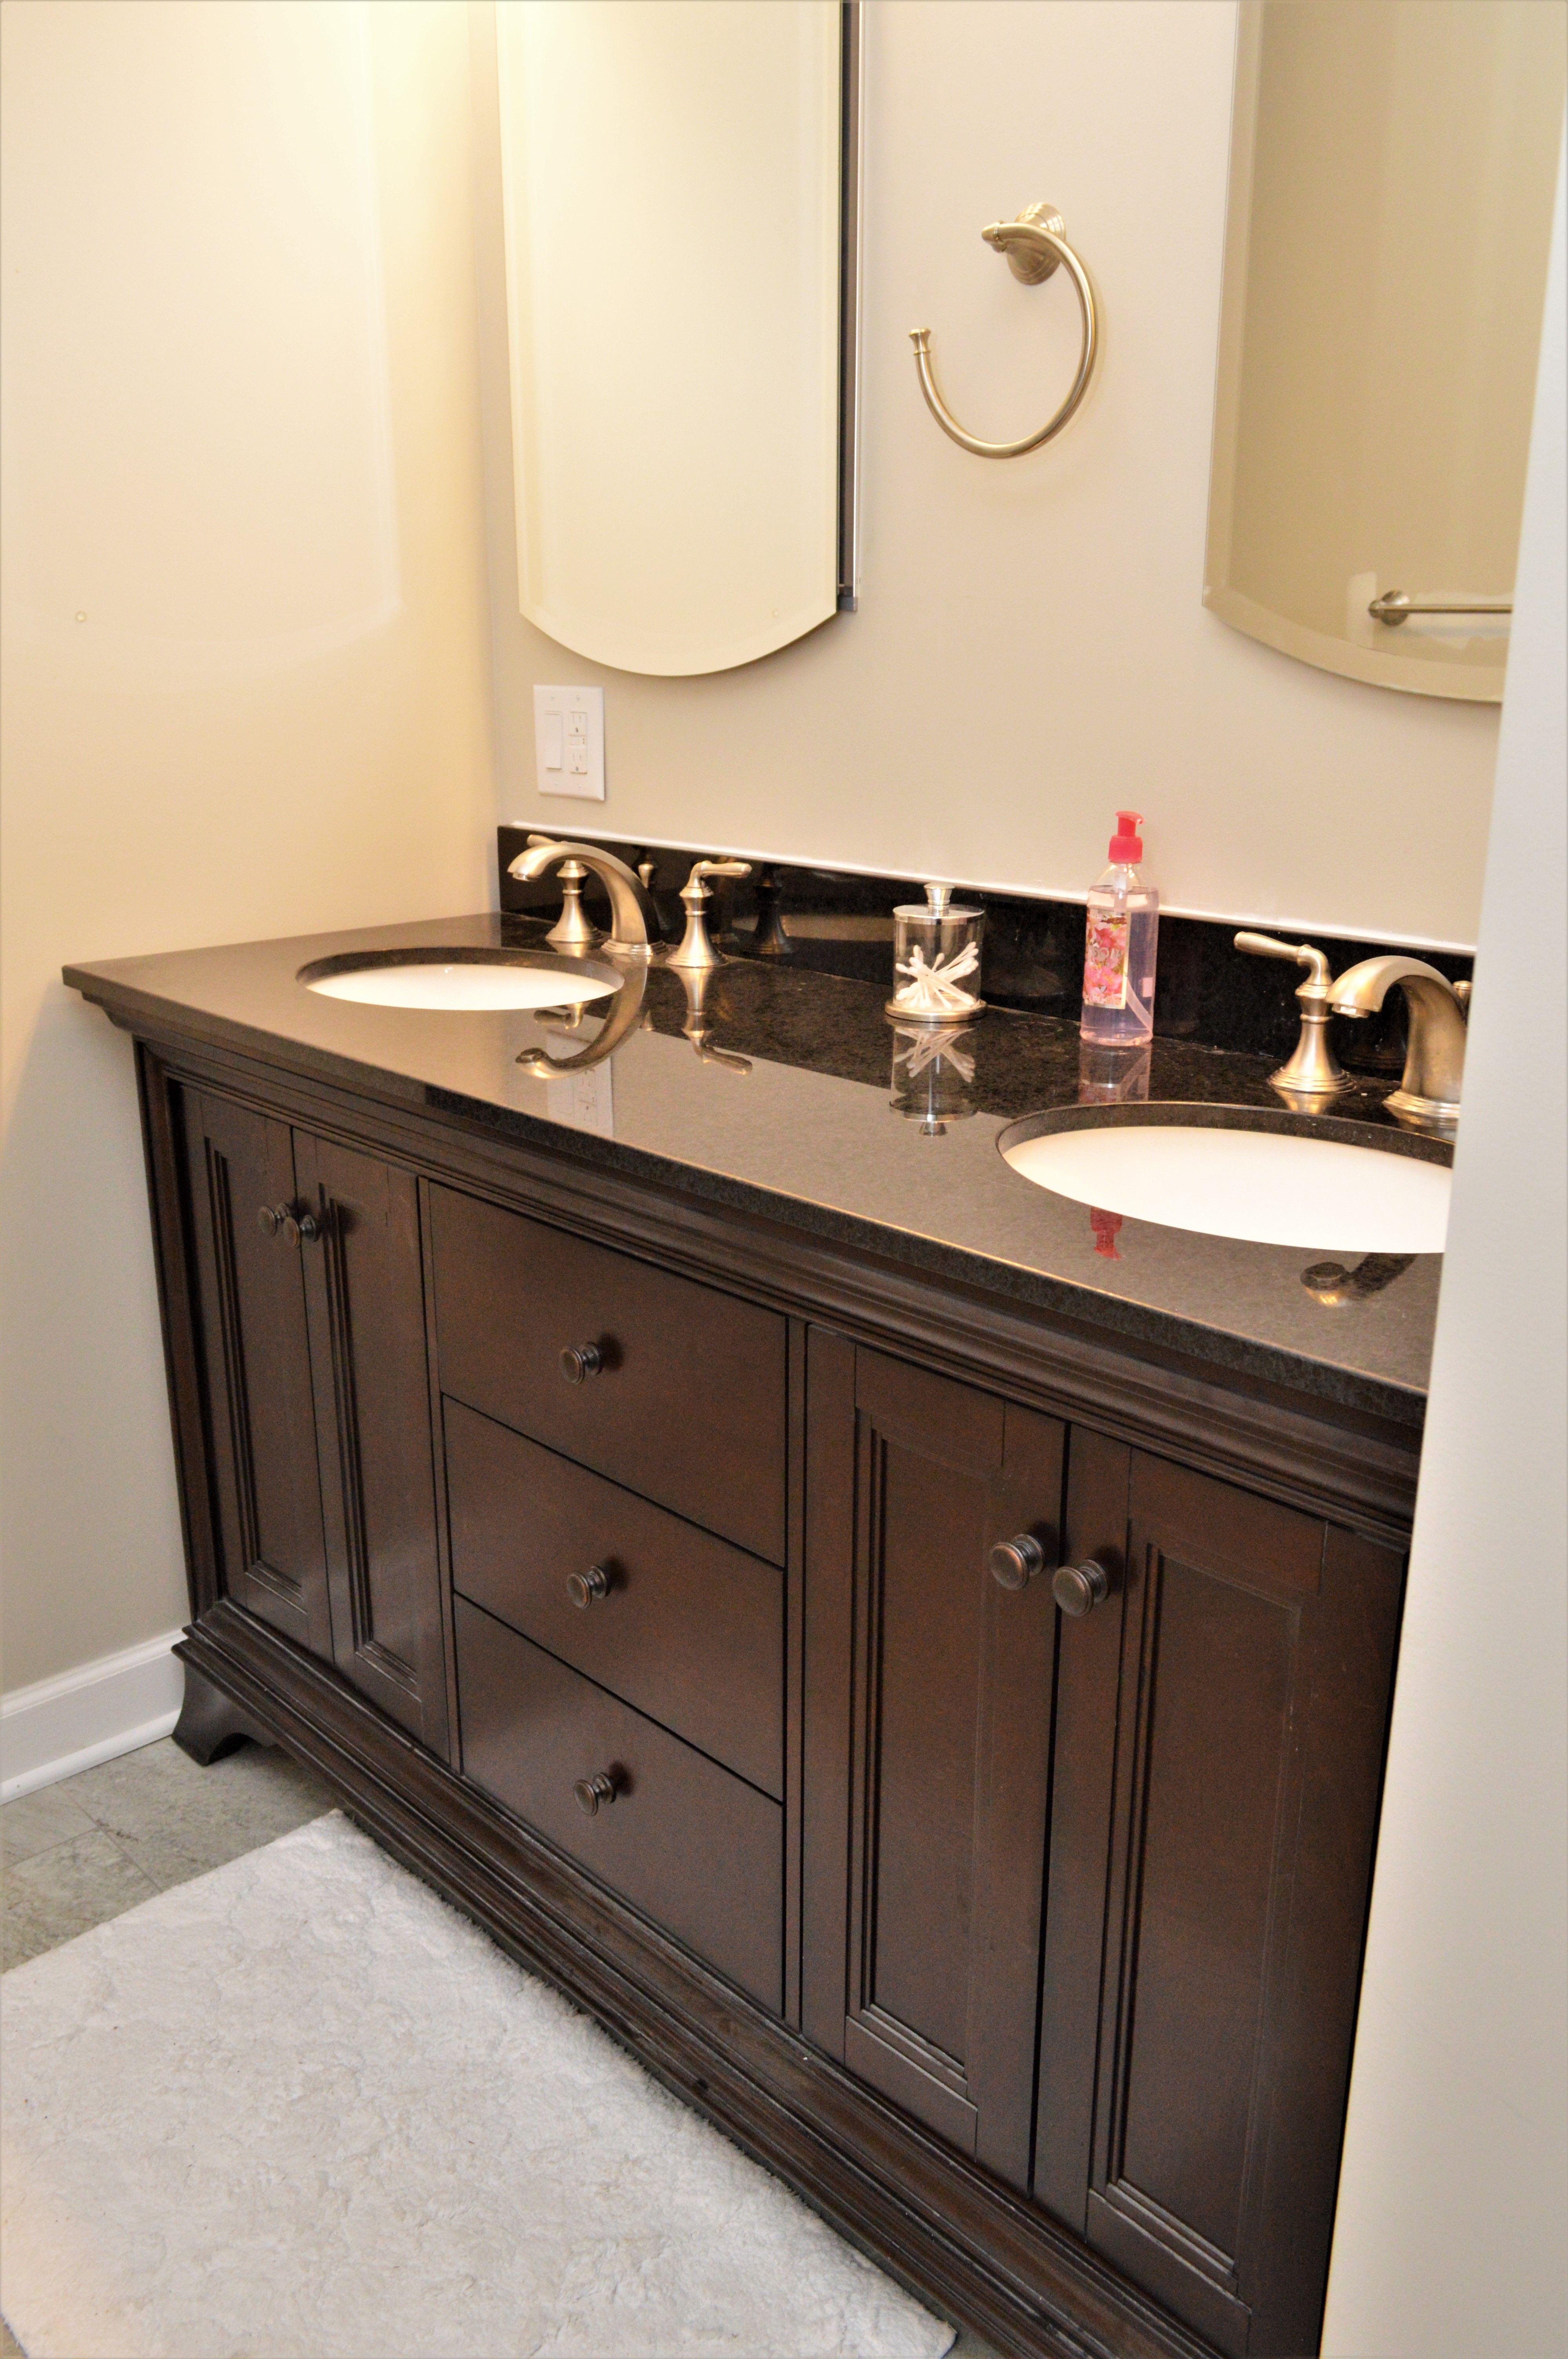 Bailey S Cabinets Floor Sale Allen Roth Eastcott Collection Double Bowl Maple Auburn Finish Diamond Black Granite To Flooring Sale Vanity Granite Tops